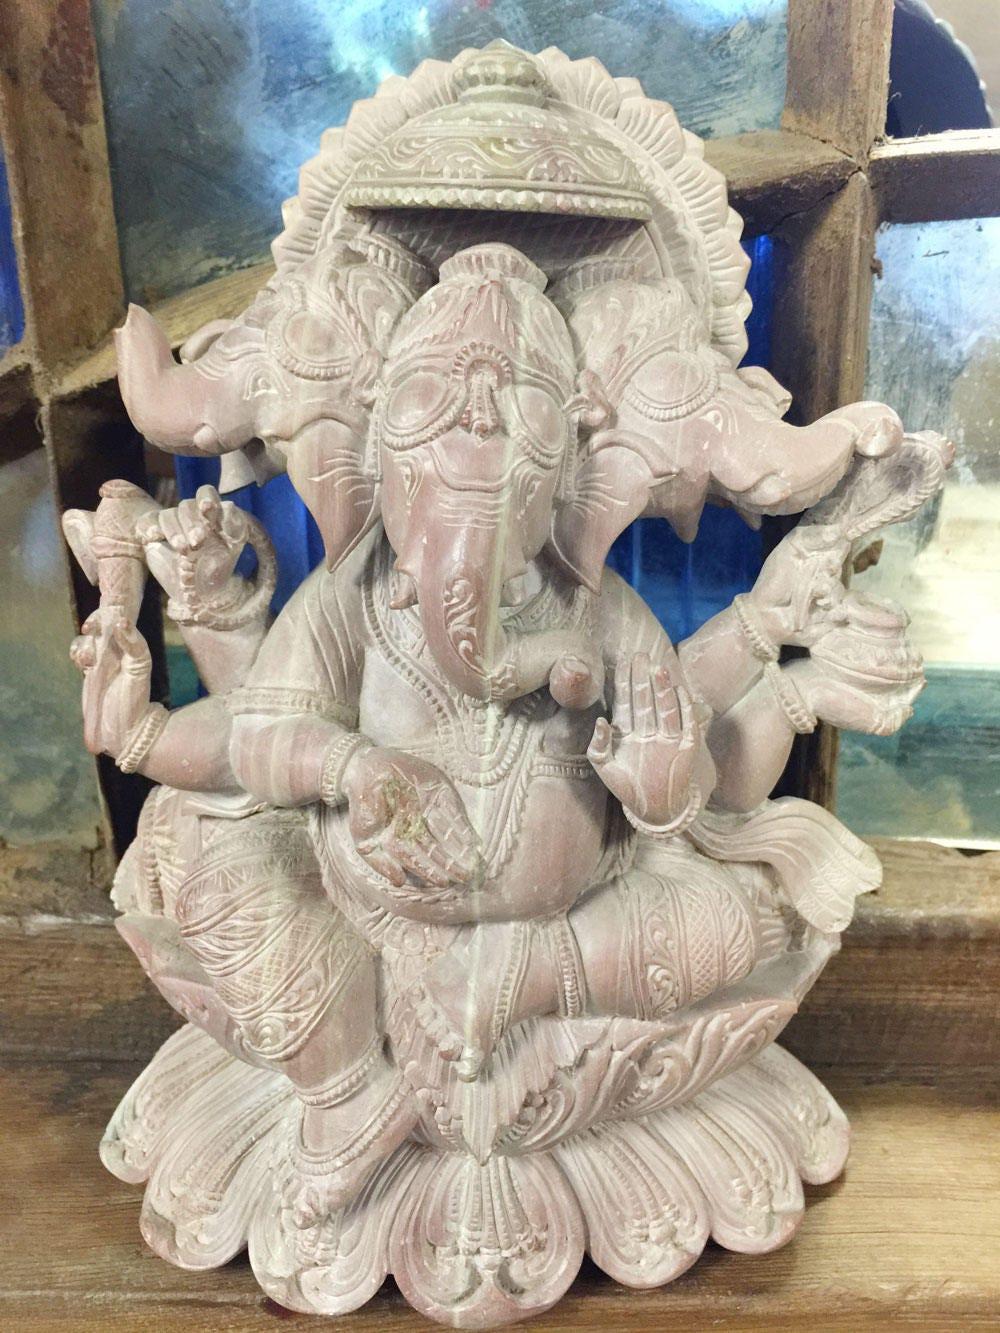 Vintage handcarved lord ganesha stone statue sculpture yoga